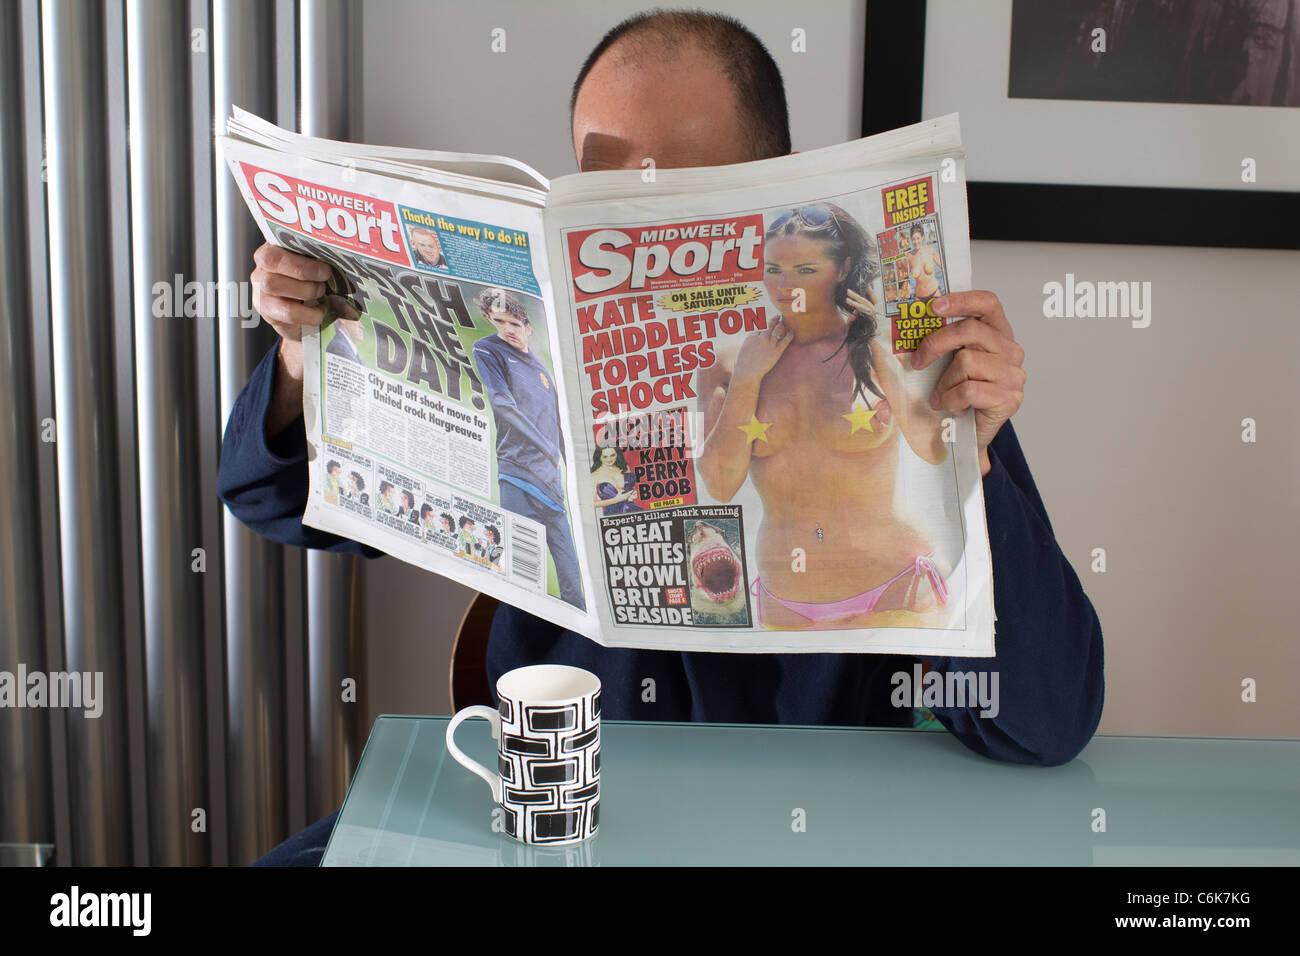 Daily, sport ,Midweek, sport, UK newspaper, - Stock Image